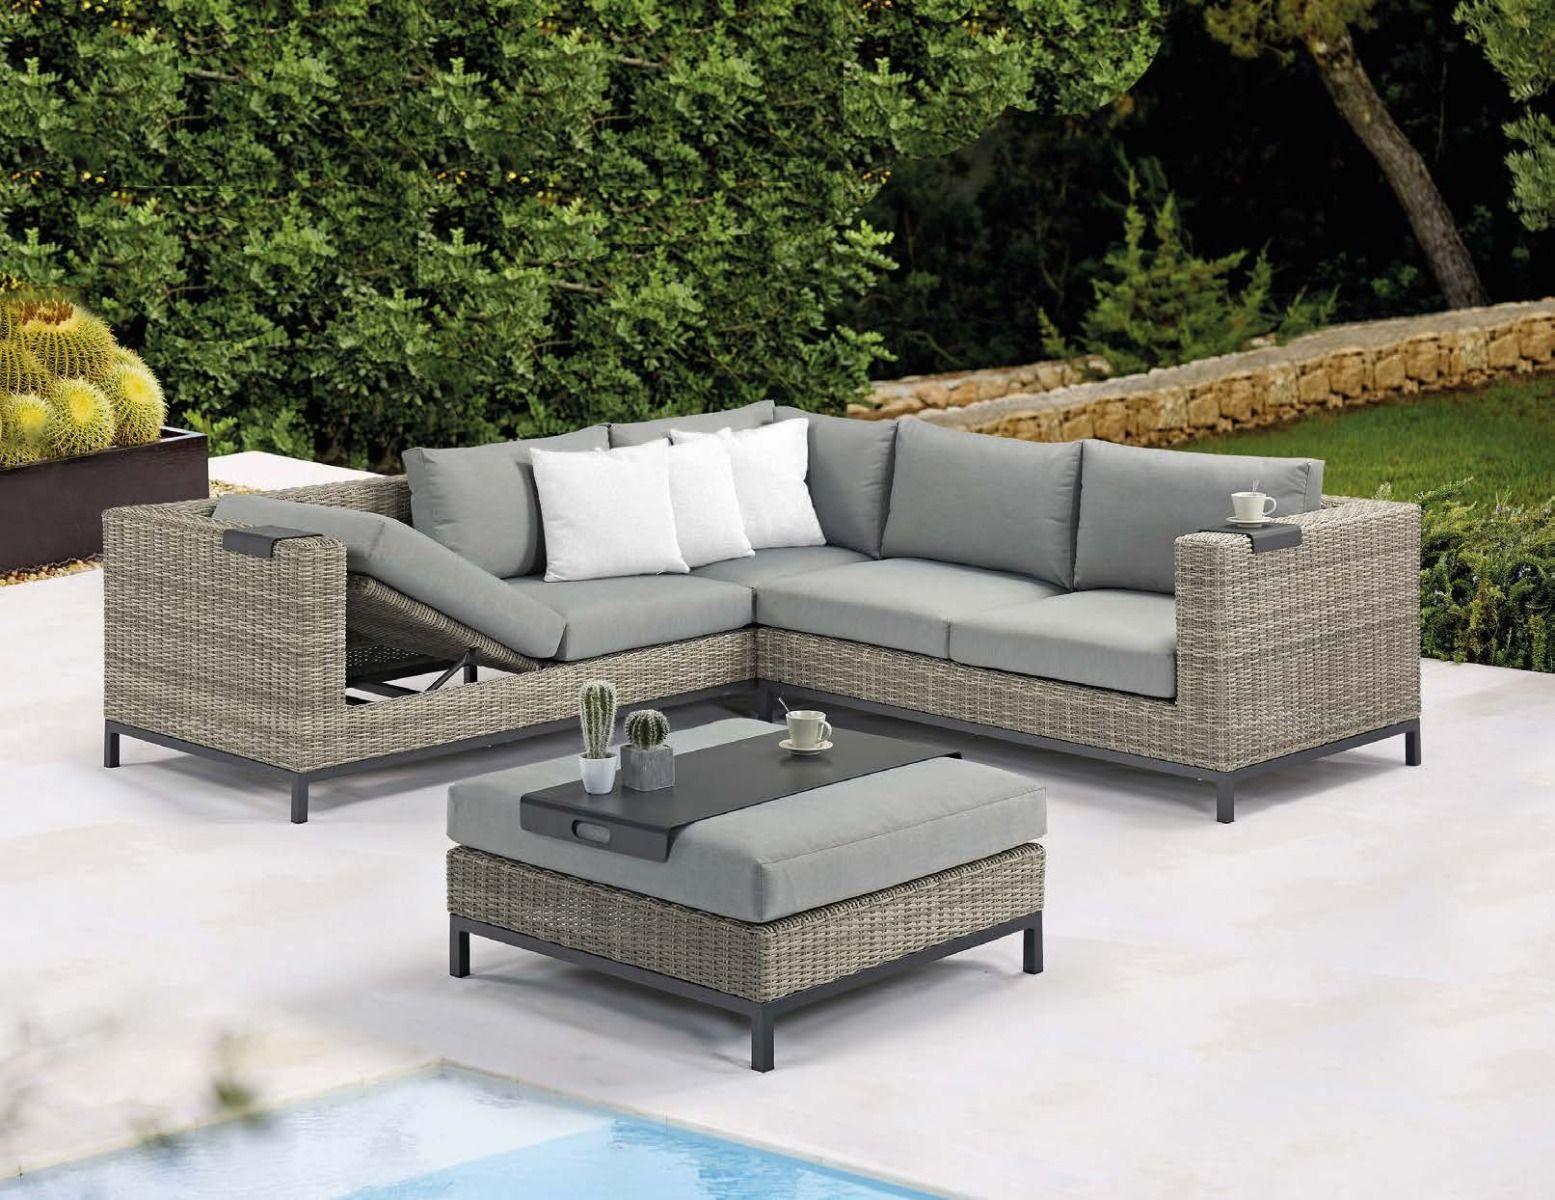 Full Size of Zebra Soho Lounge 5285 Komplettset Kunsthandel Lohmannde Wohnzimmer Couch Terrasse